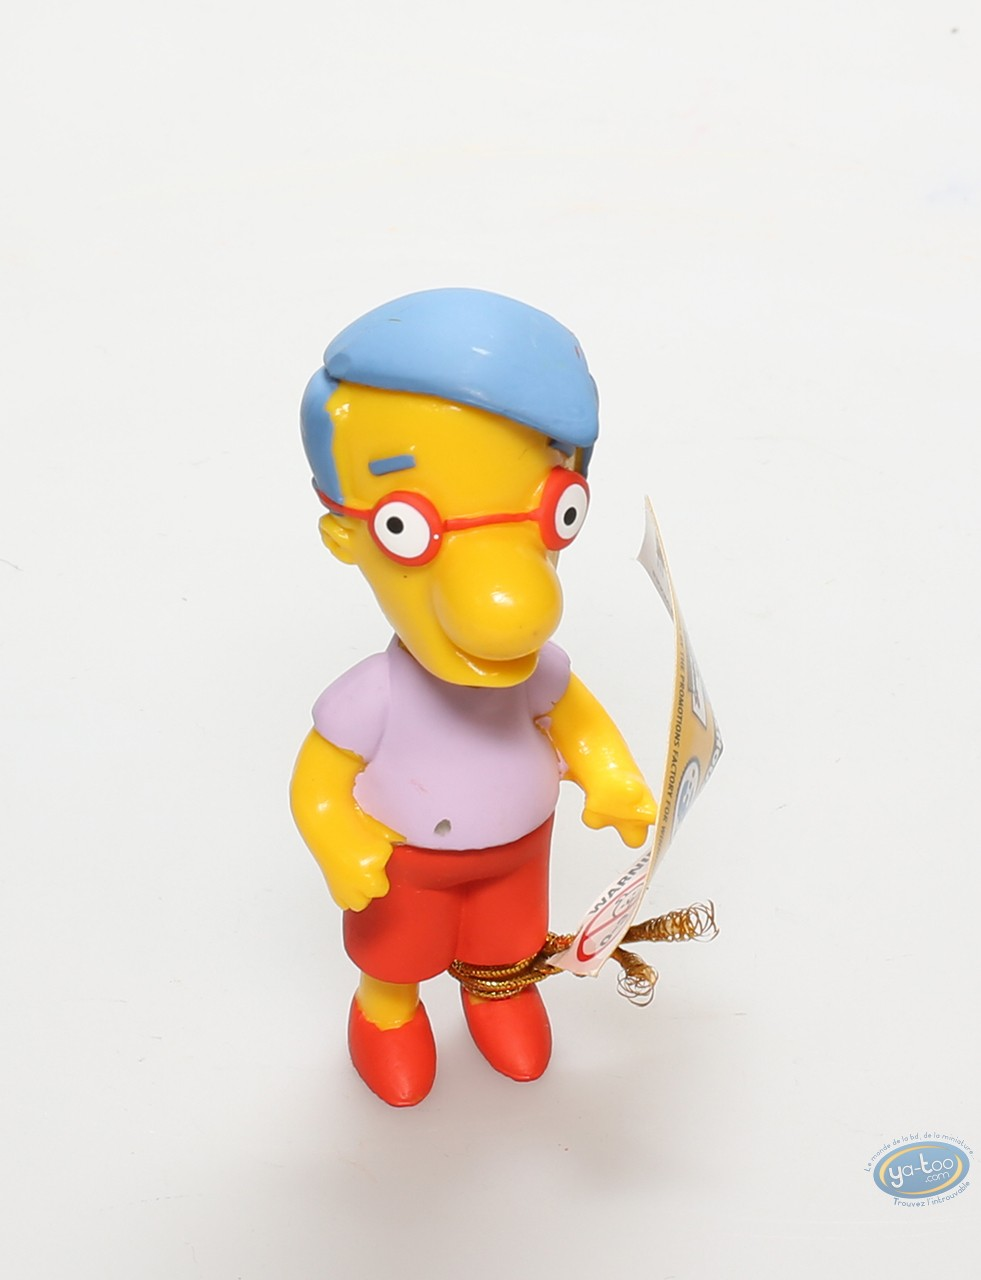 Plastic Figurine, Simpson (Les) : Milhouse Van Houten